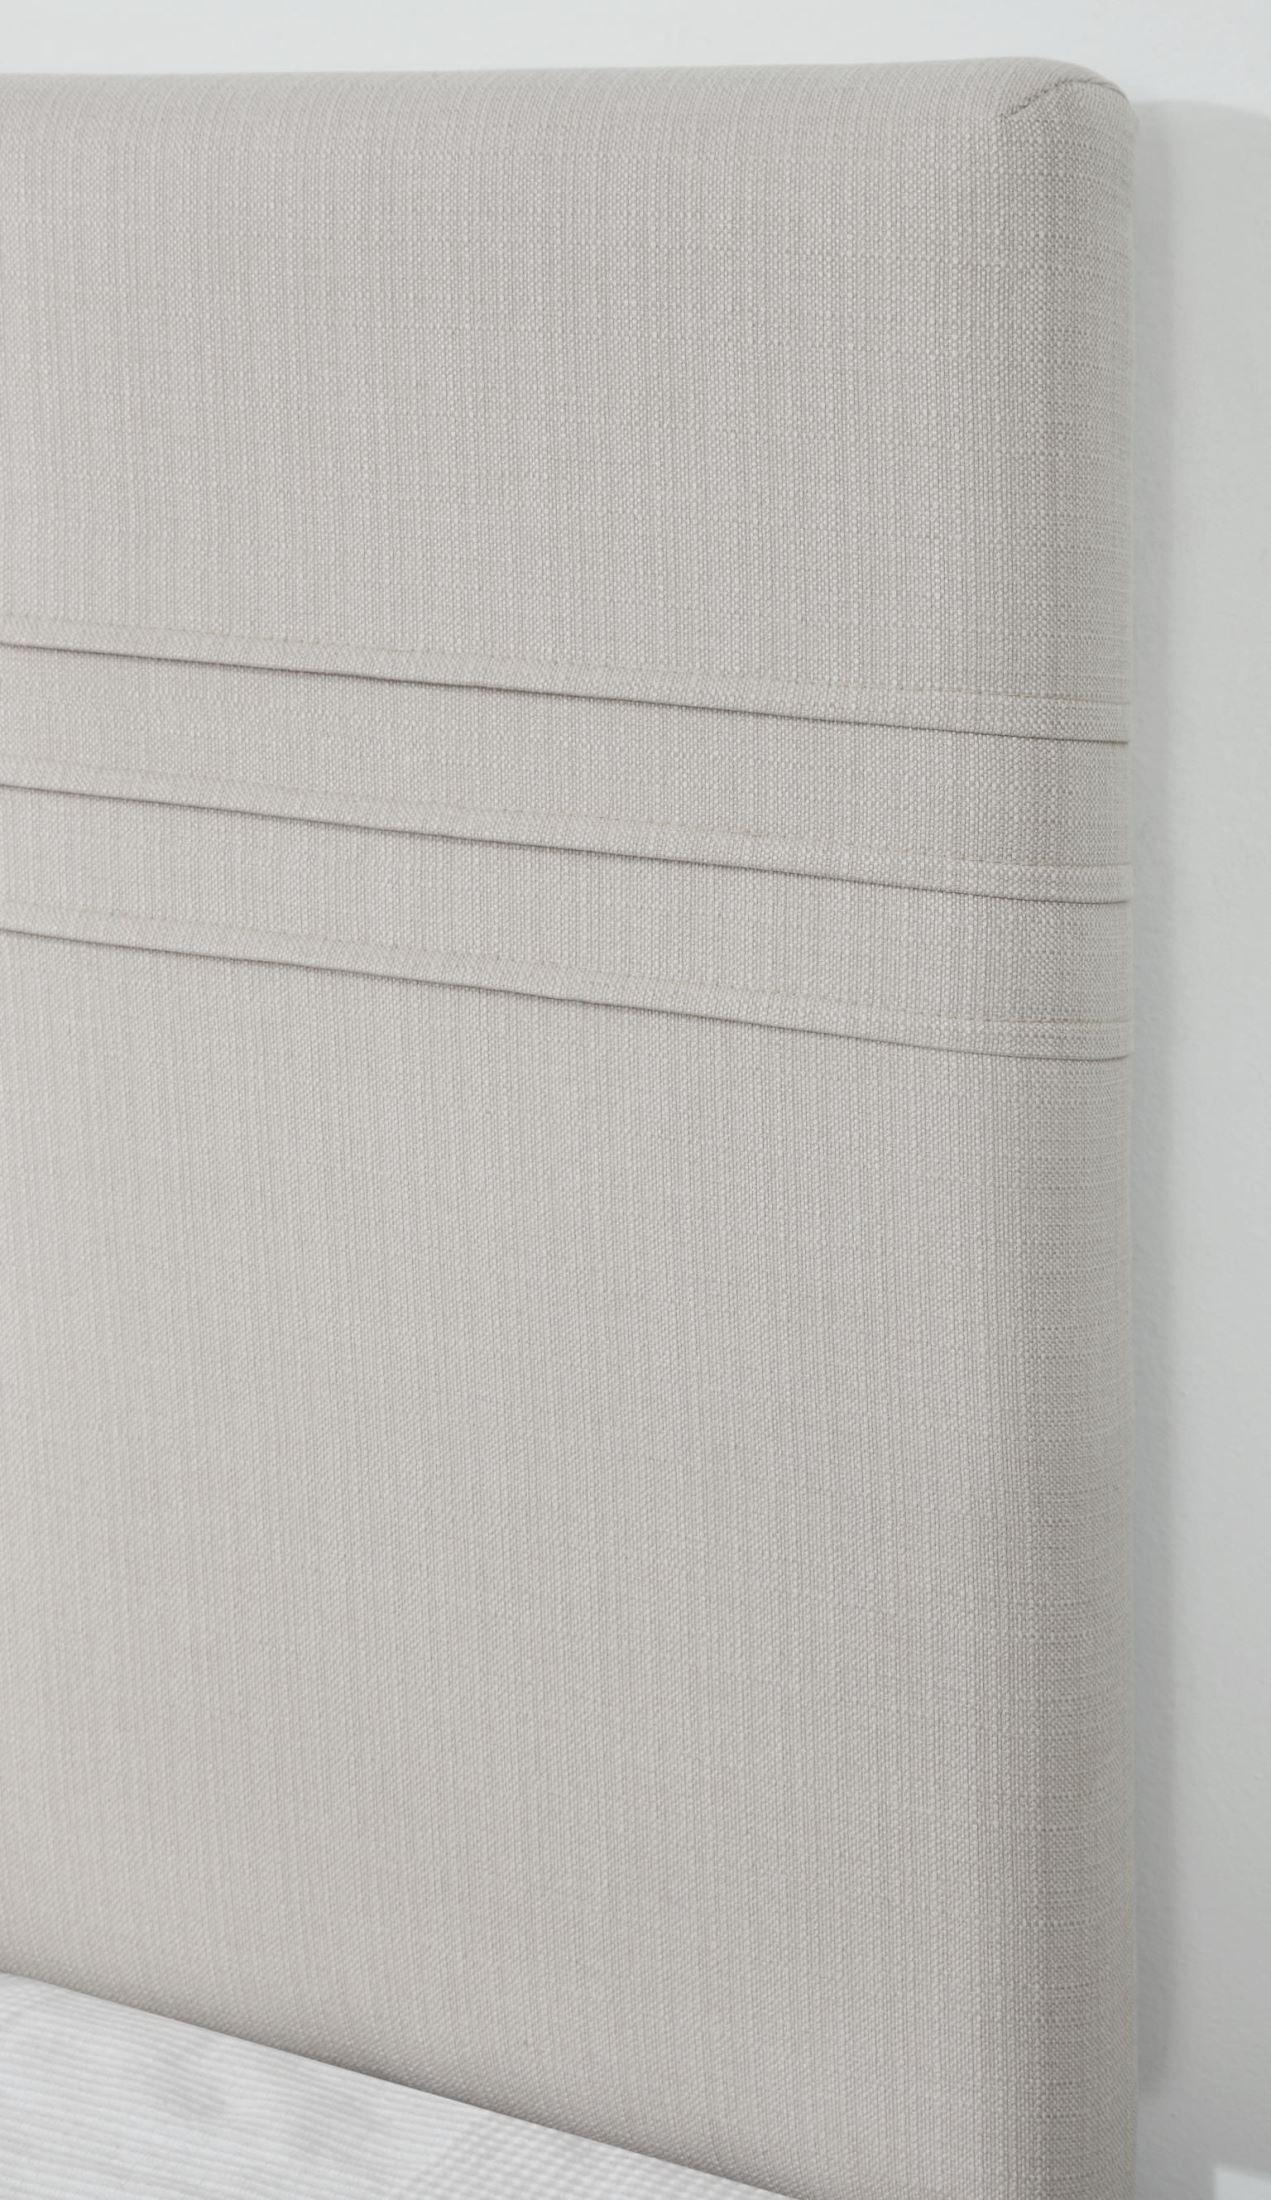 silver upholstered headboard